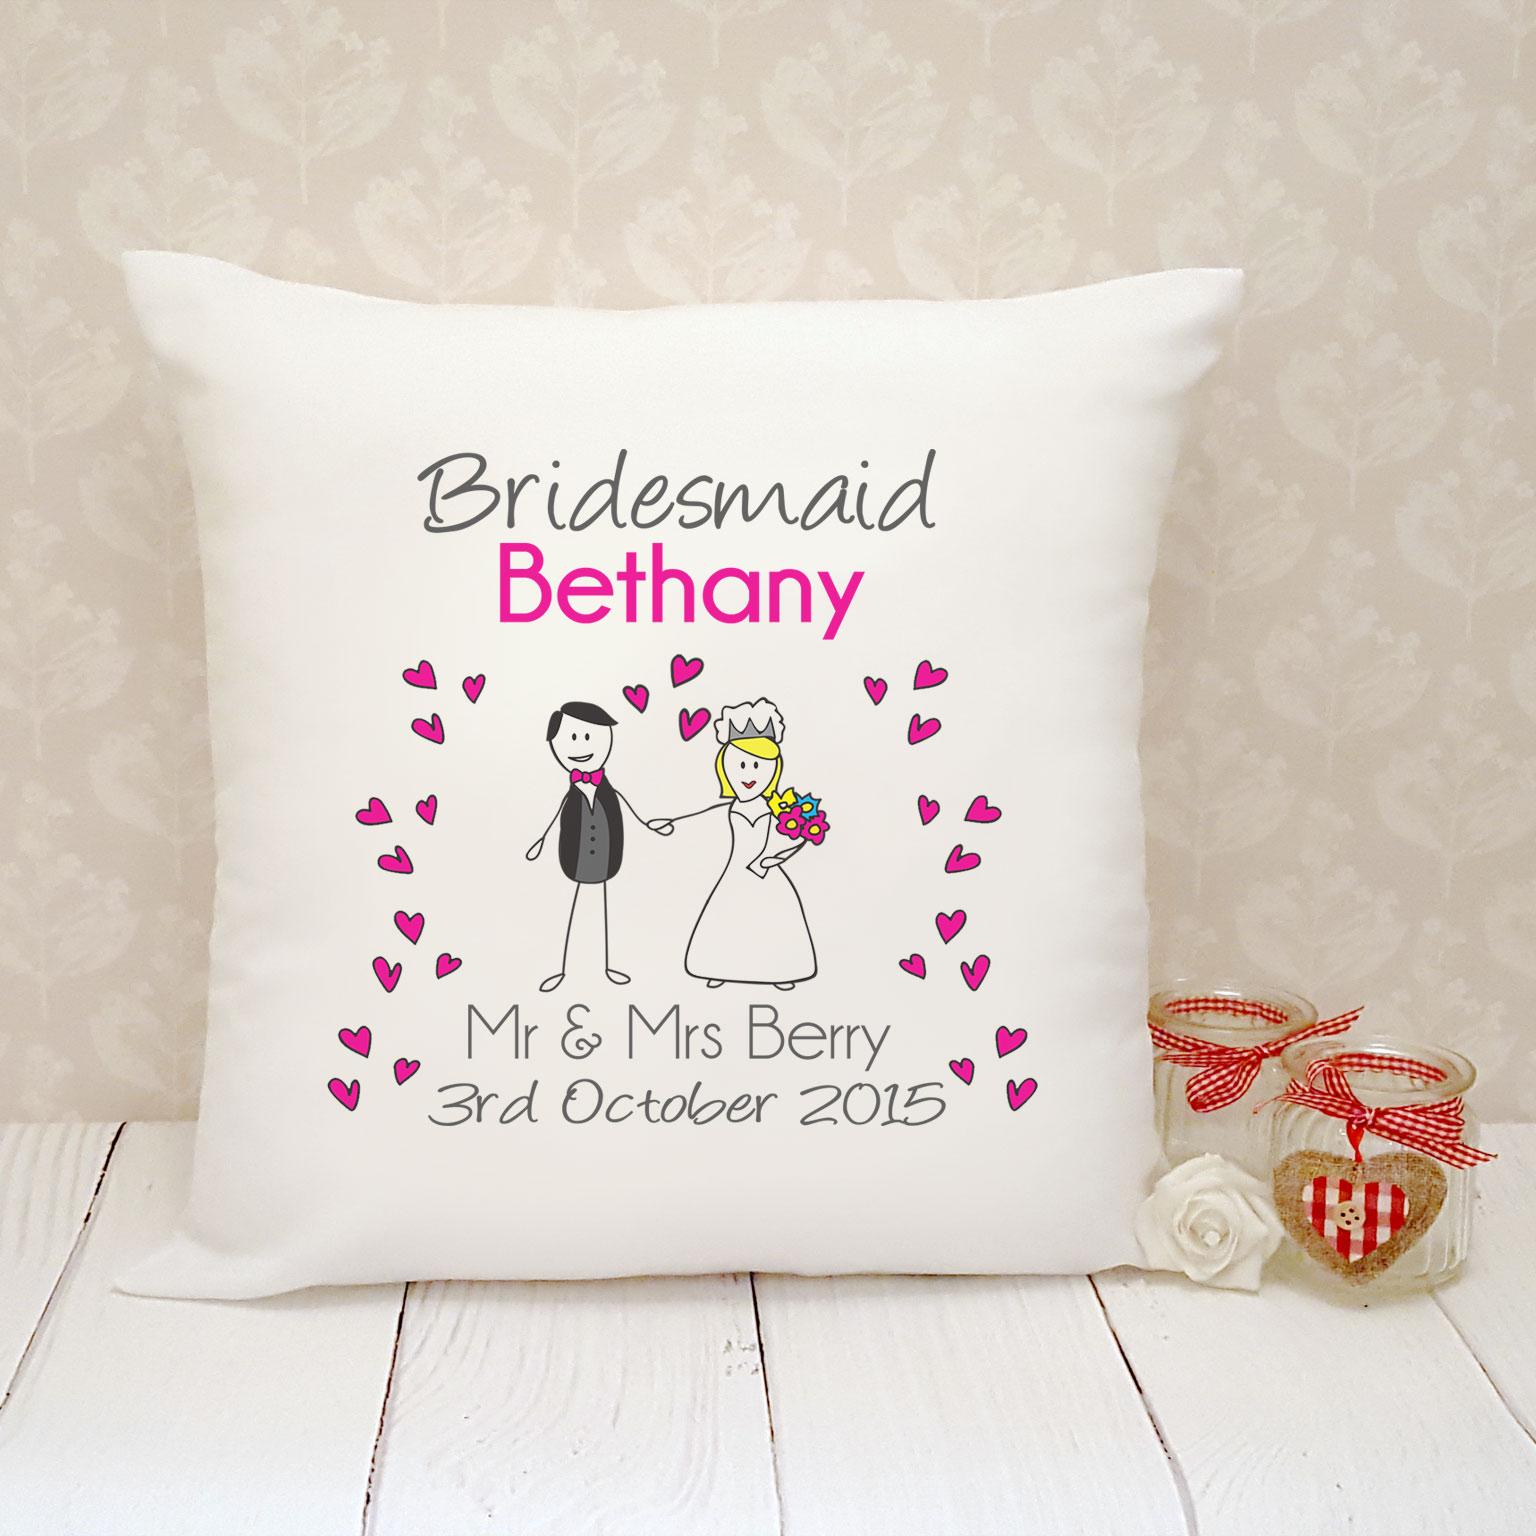 Bridesmaids Favors, Wedding Favors, Cushion, Personalised Cushion, Bridesmaid Cushion